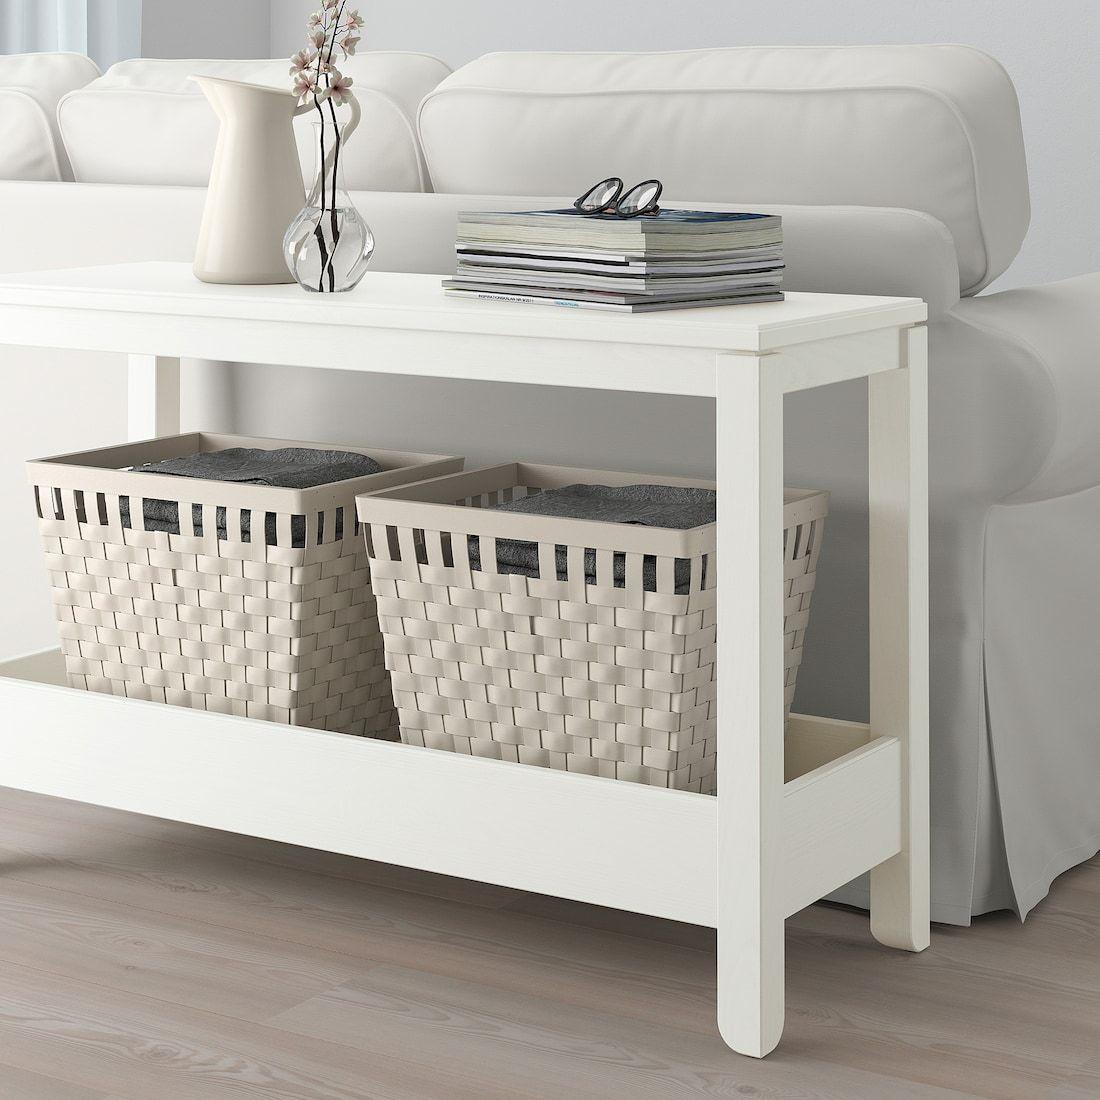 Ikea Havsta White Console Table In 2020 White Console Table Console Table Ikea